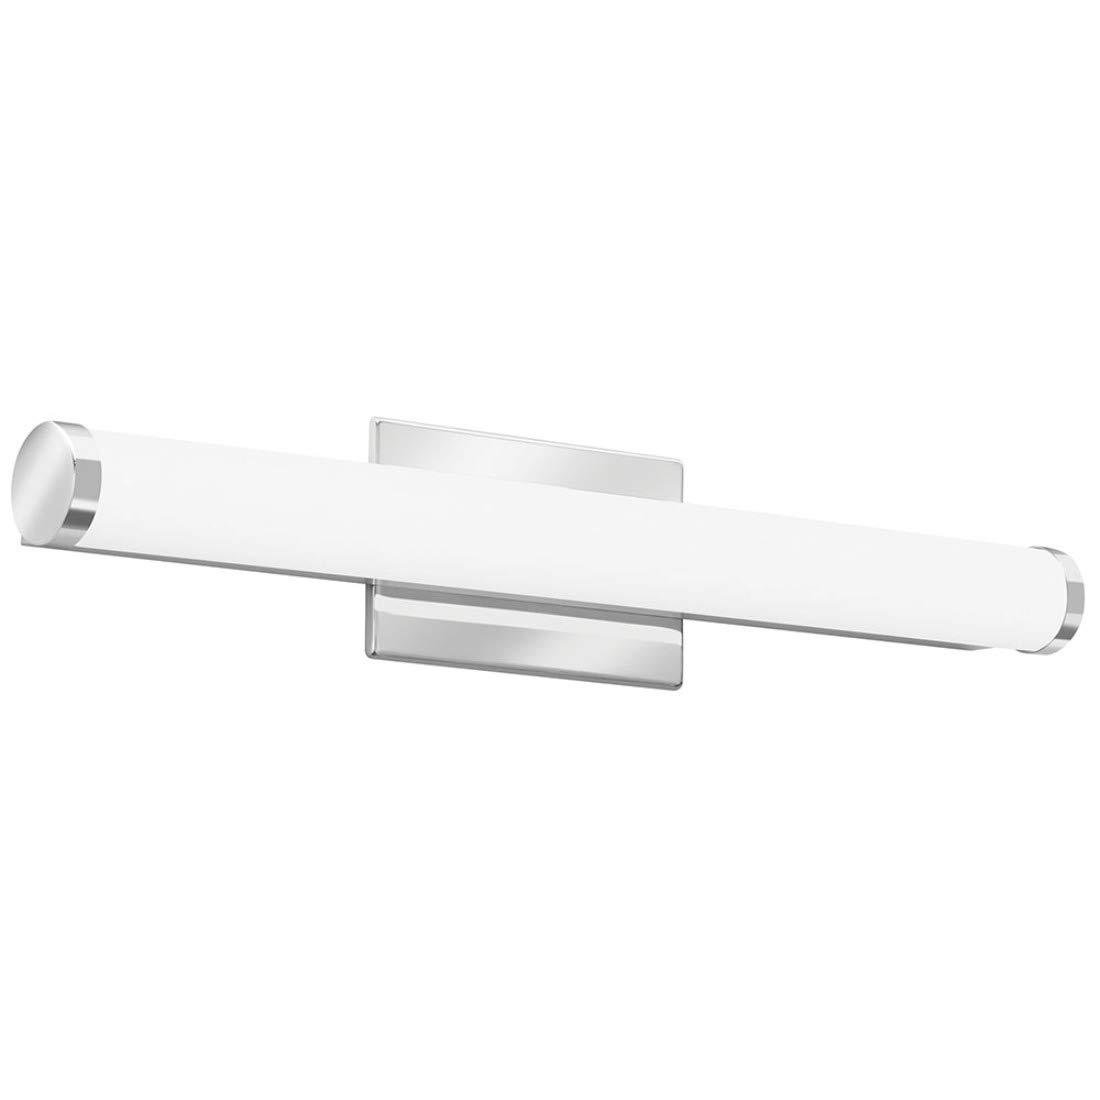 Lithonia Lighting FMVCCLS 24IN MVOLT 30K35K40K 90CRI KR M6 Vanity Fixture, Cylinder, Color Temperature Switchable